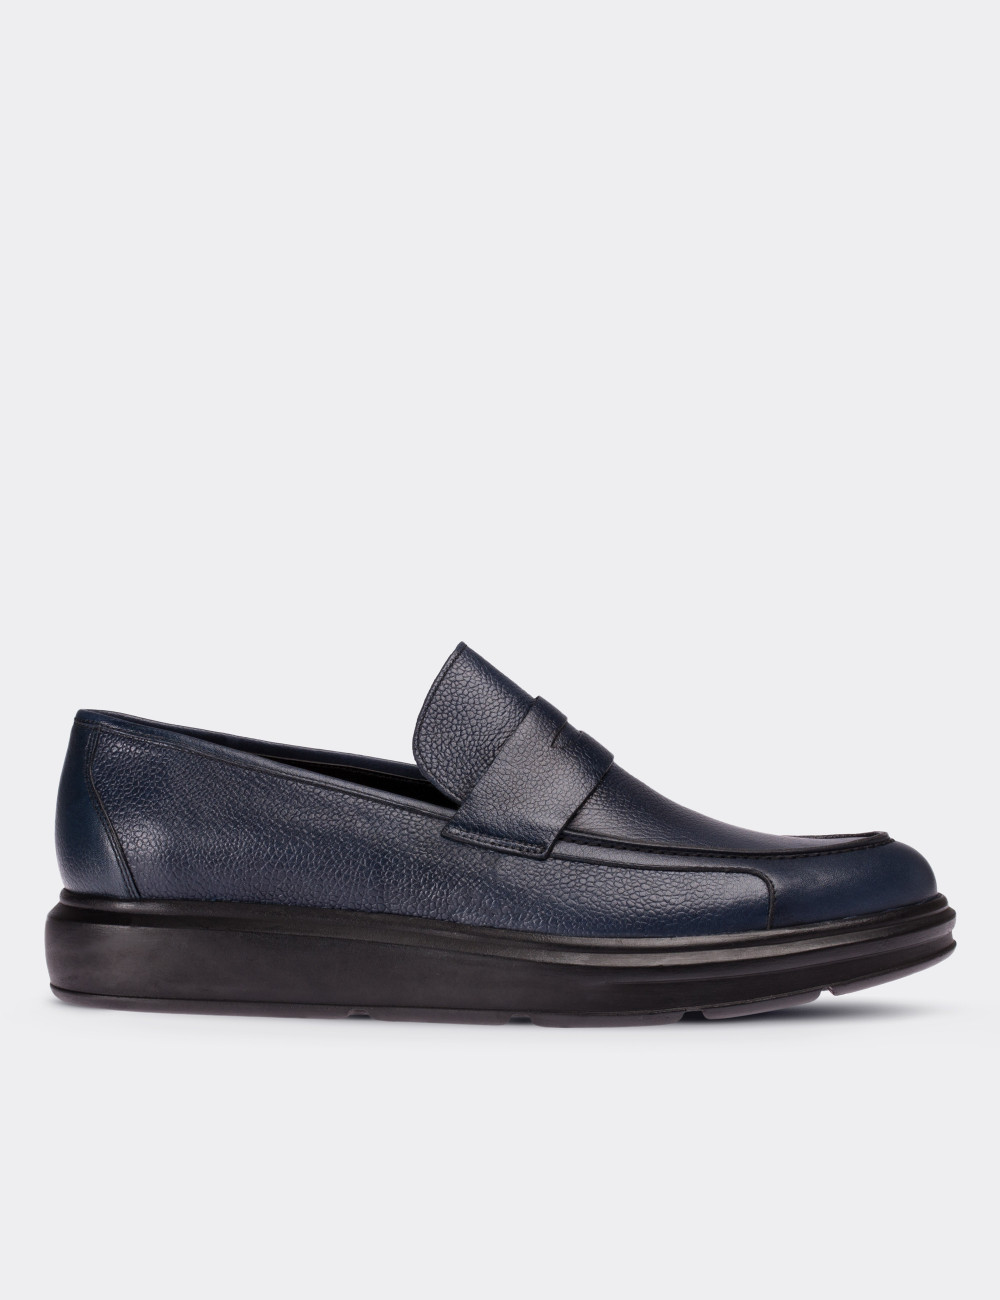 Hakiki Deri Lacivert Comfort Erkek Loafer - 01564MLCVP01